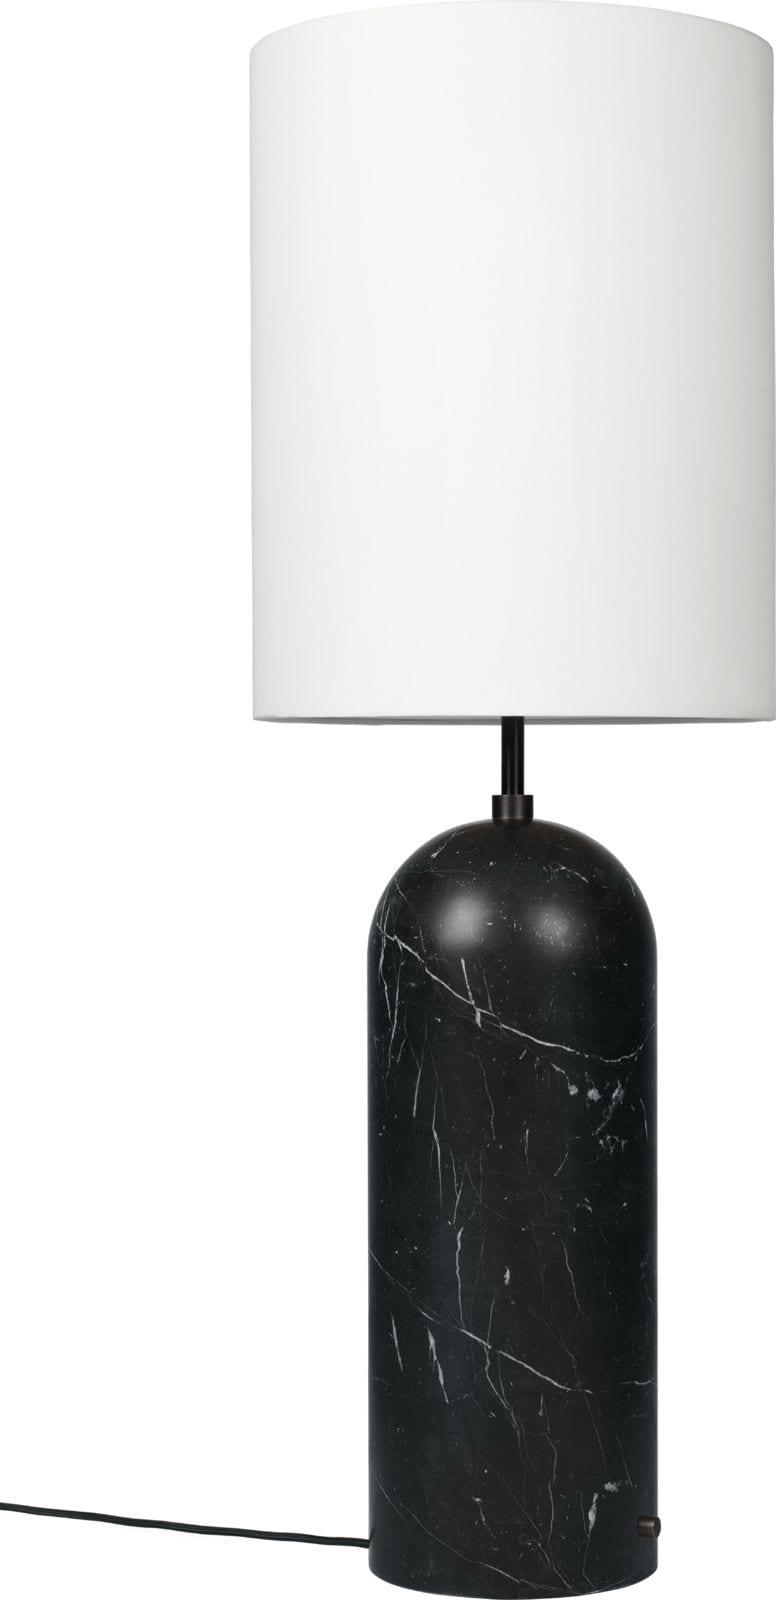 Gravity Floor Lamp, XL High